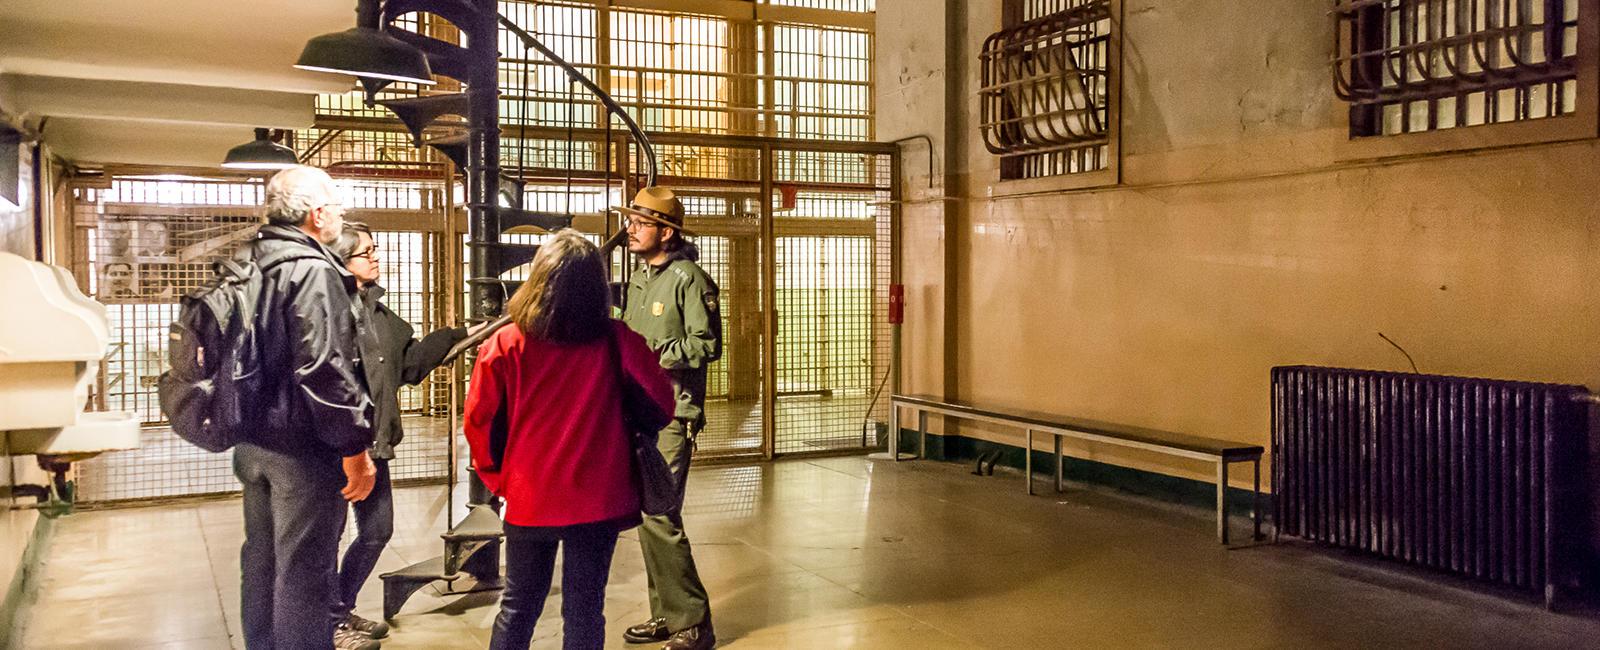 Alcatraz cell block visitors